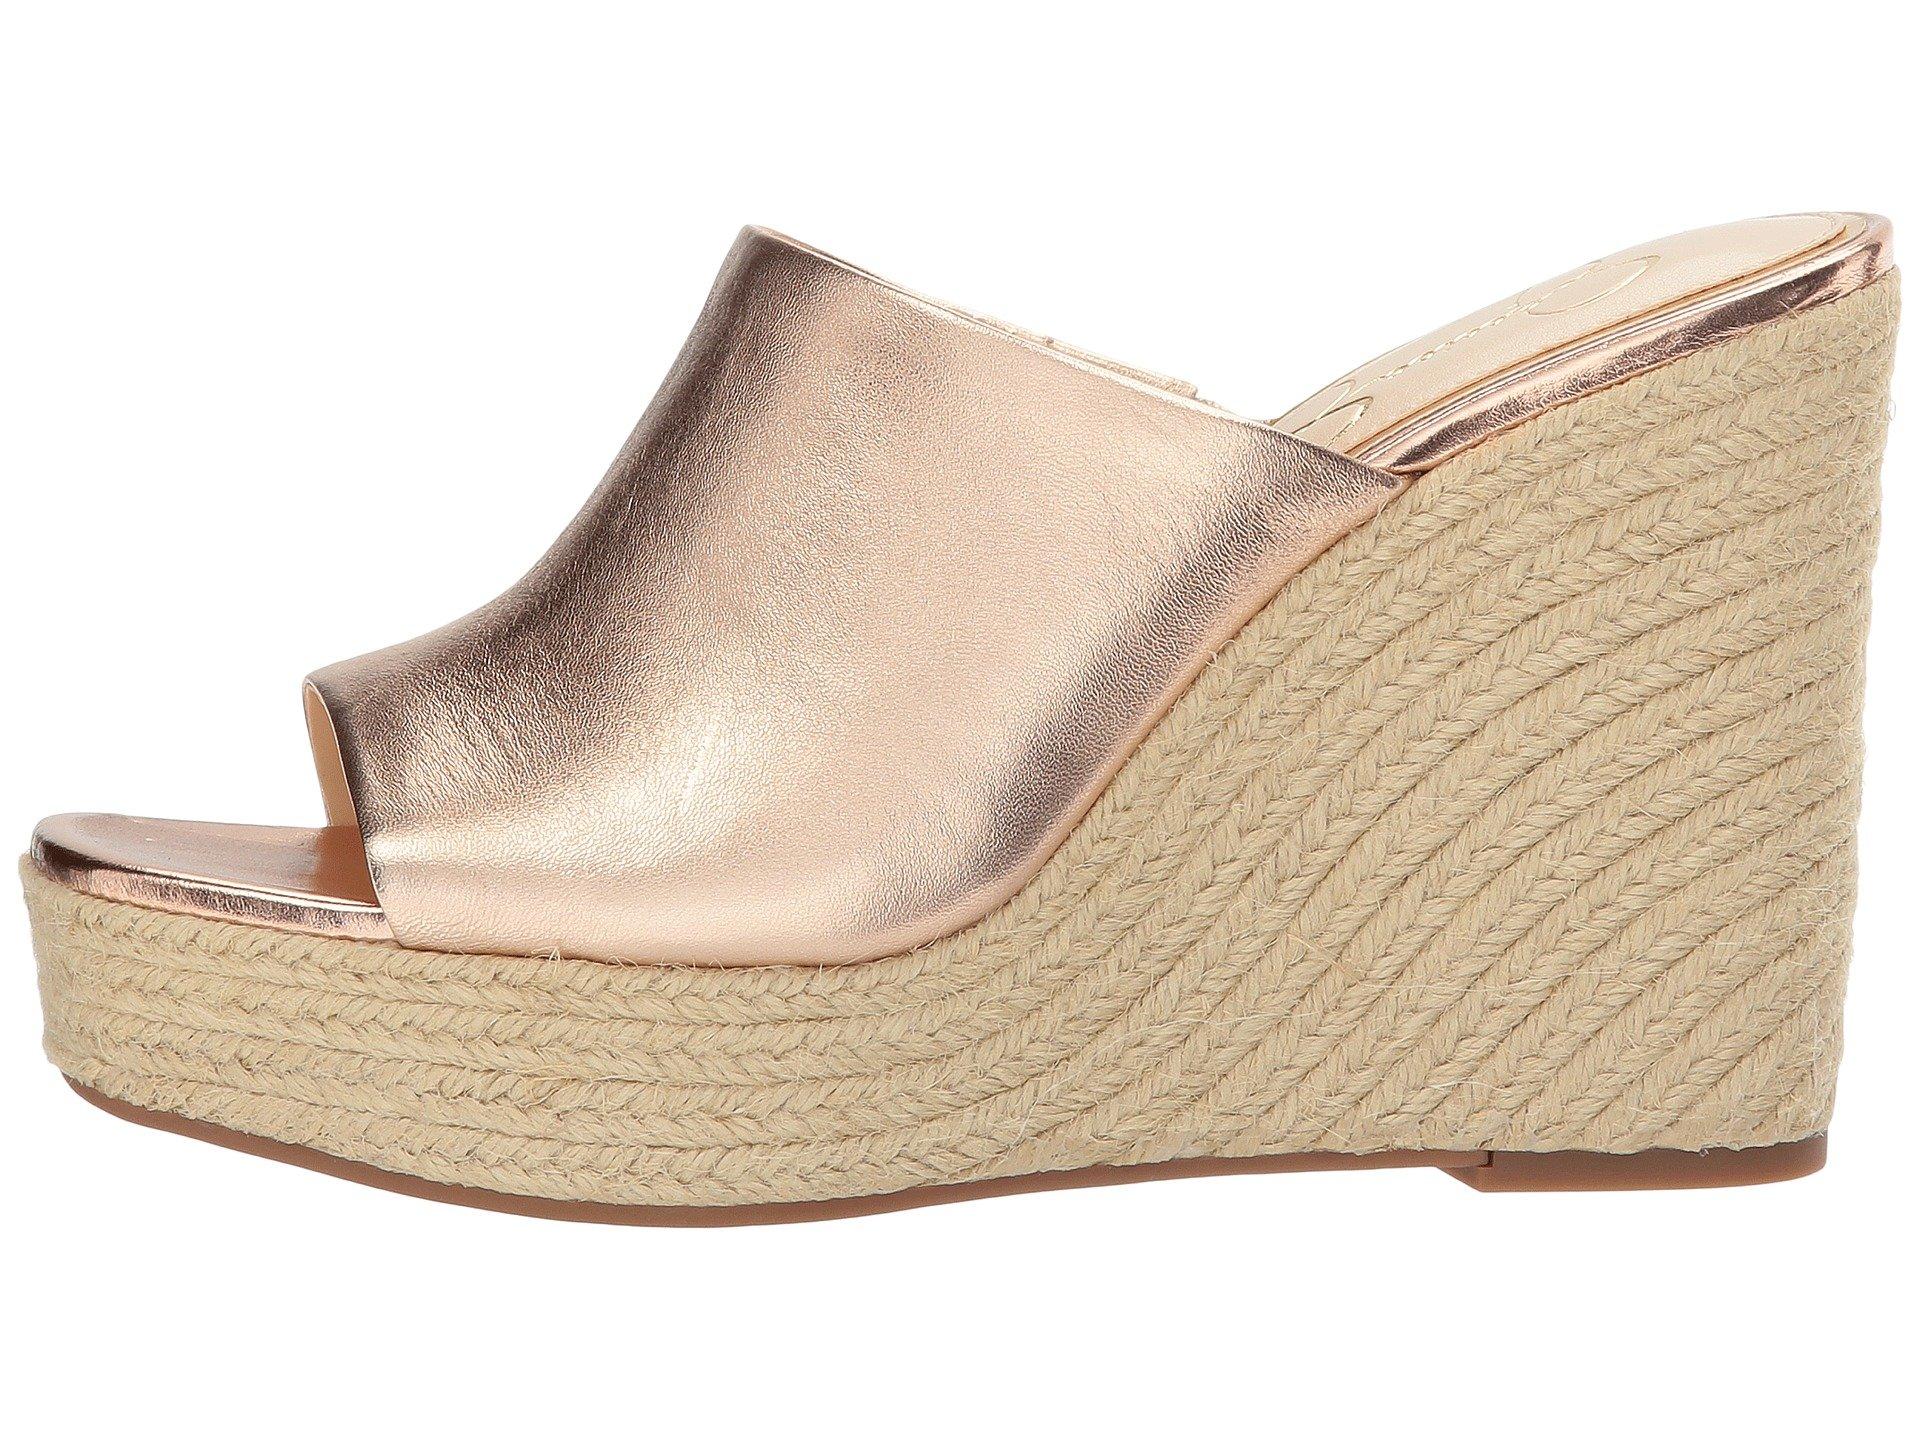 c75034e4b12c Jessica Simpson Women s SIRELLA Espadrille Wedge Sandal